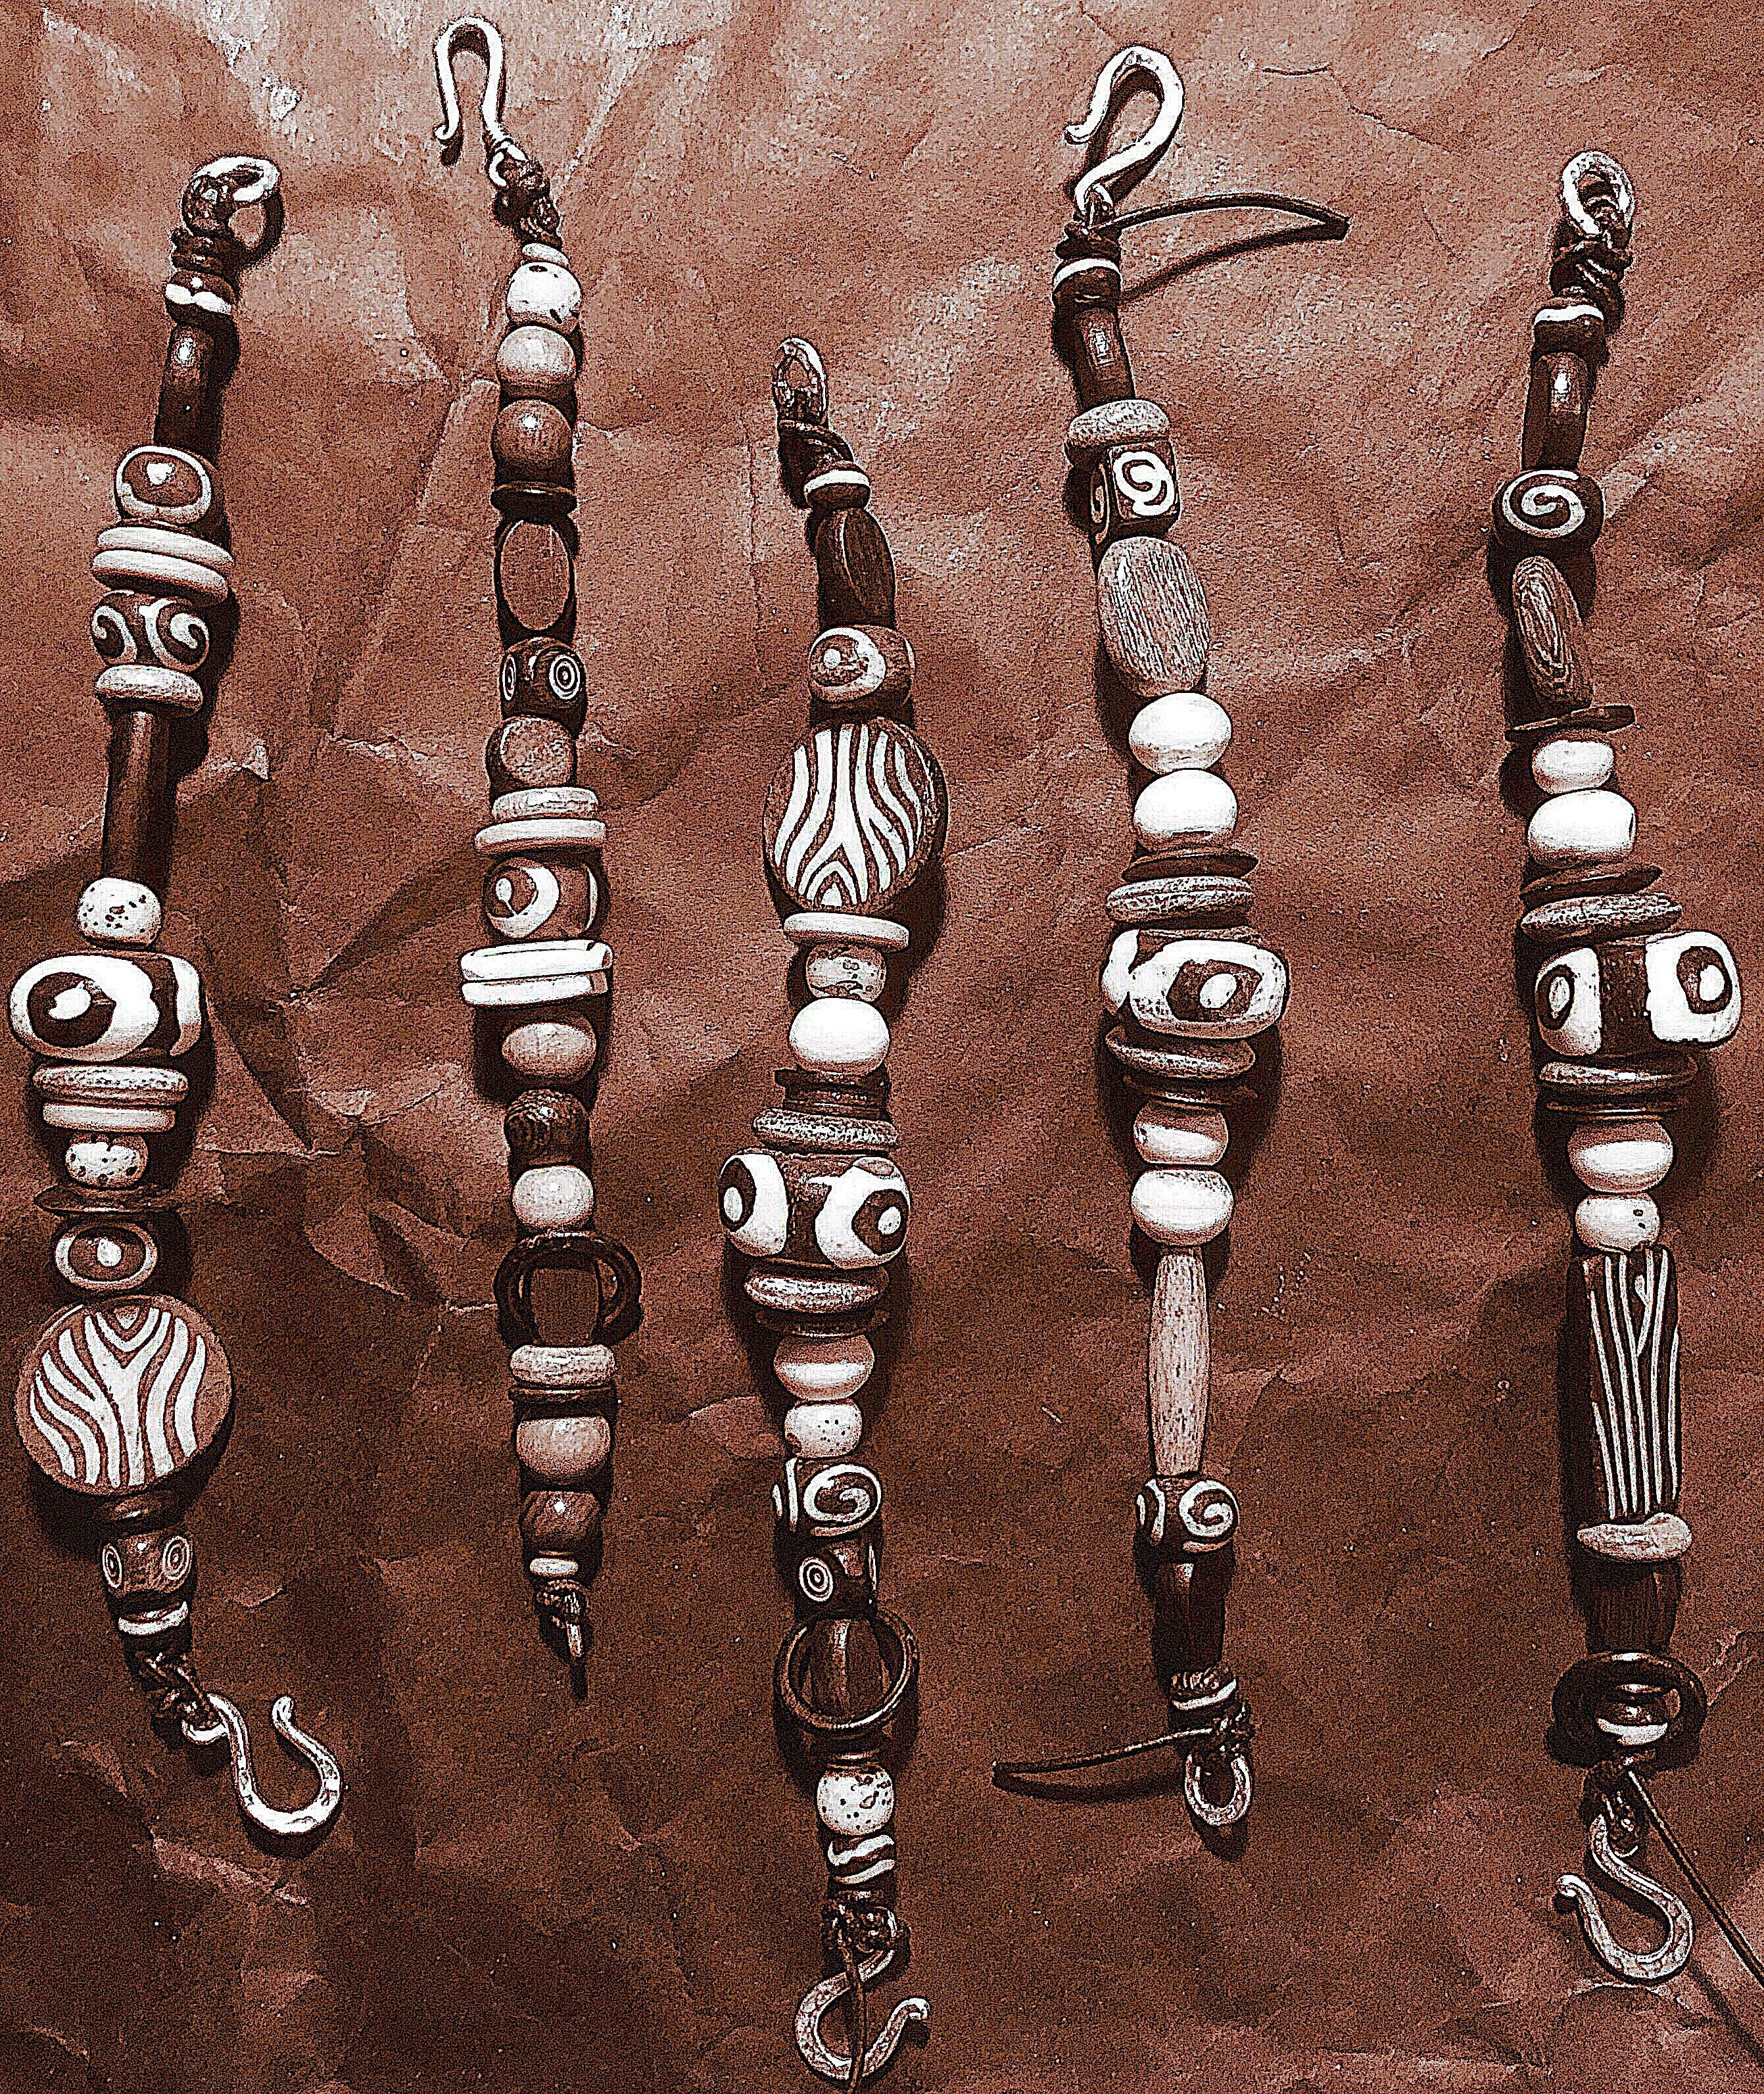 Wood Bone Leather Amp Silver Bracelet Hiawatha D Hiawathad